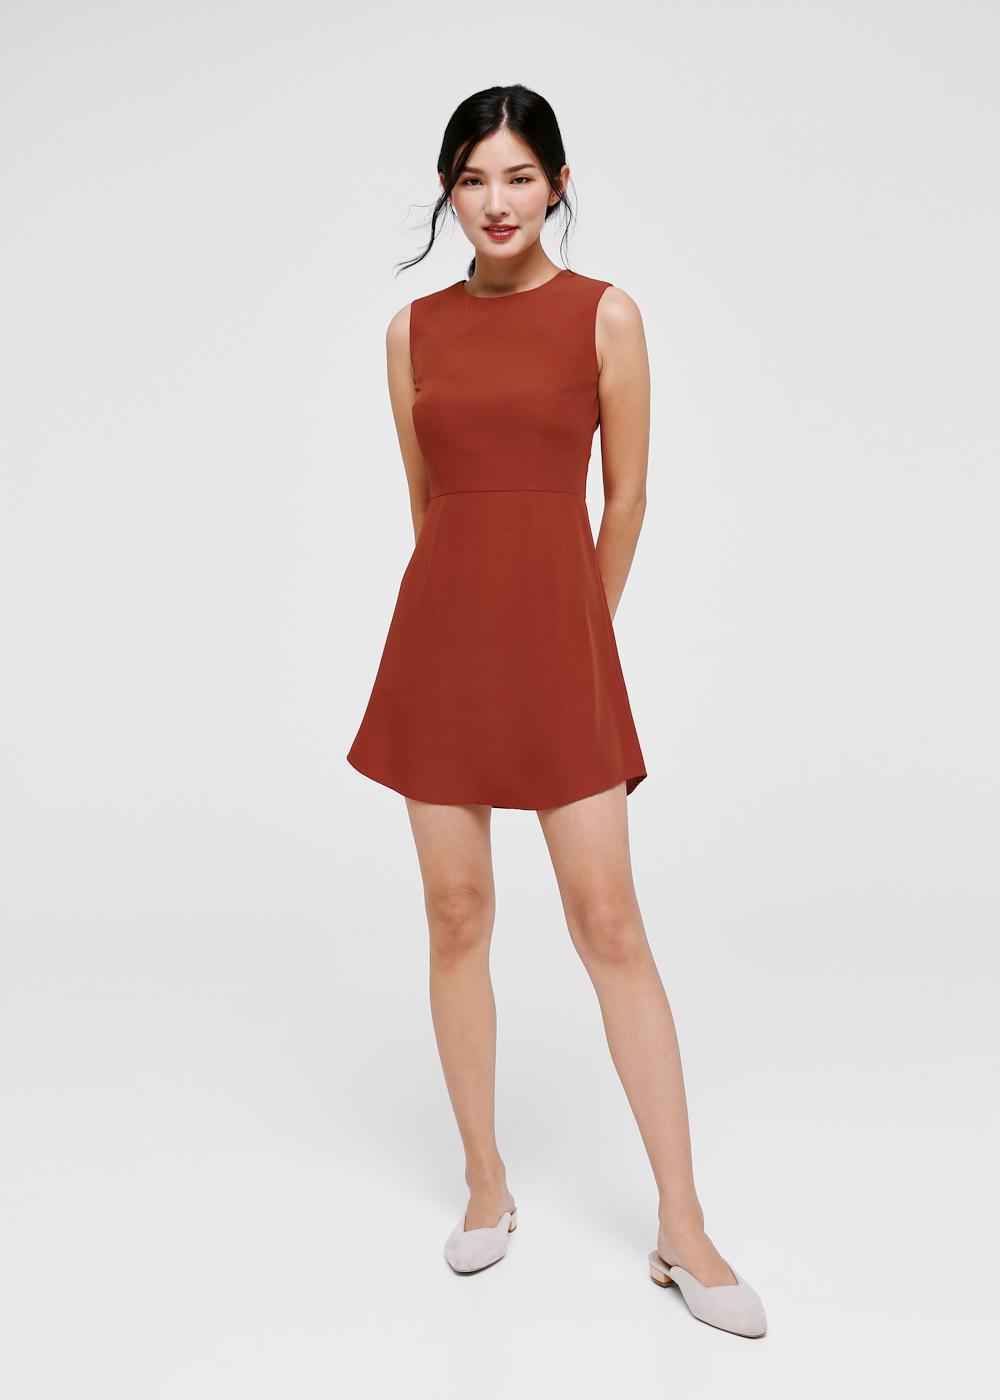 Desiree Curved Hem A-line Dress-344-XS